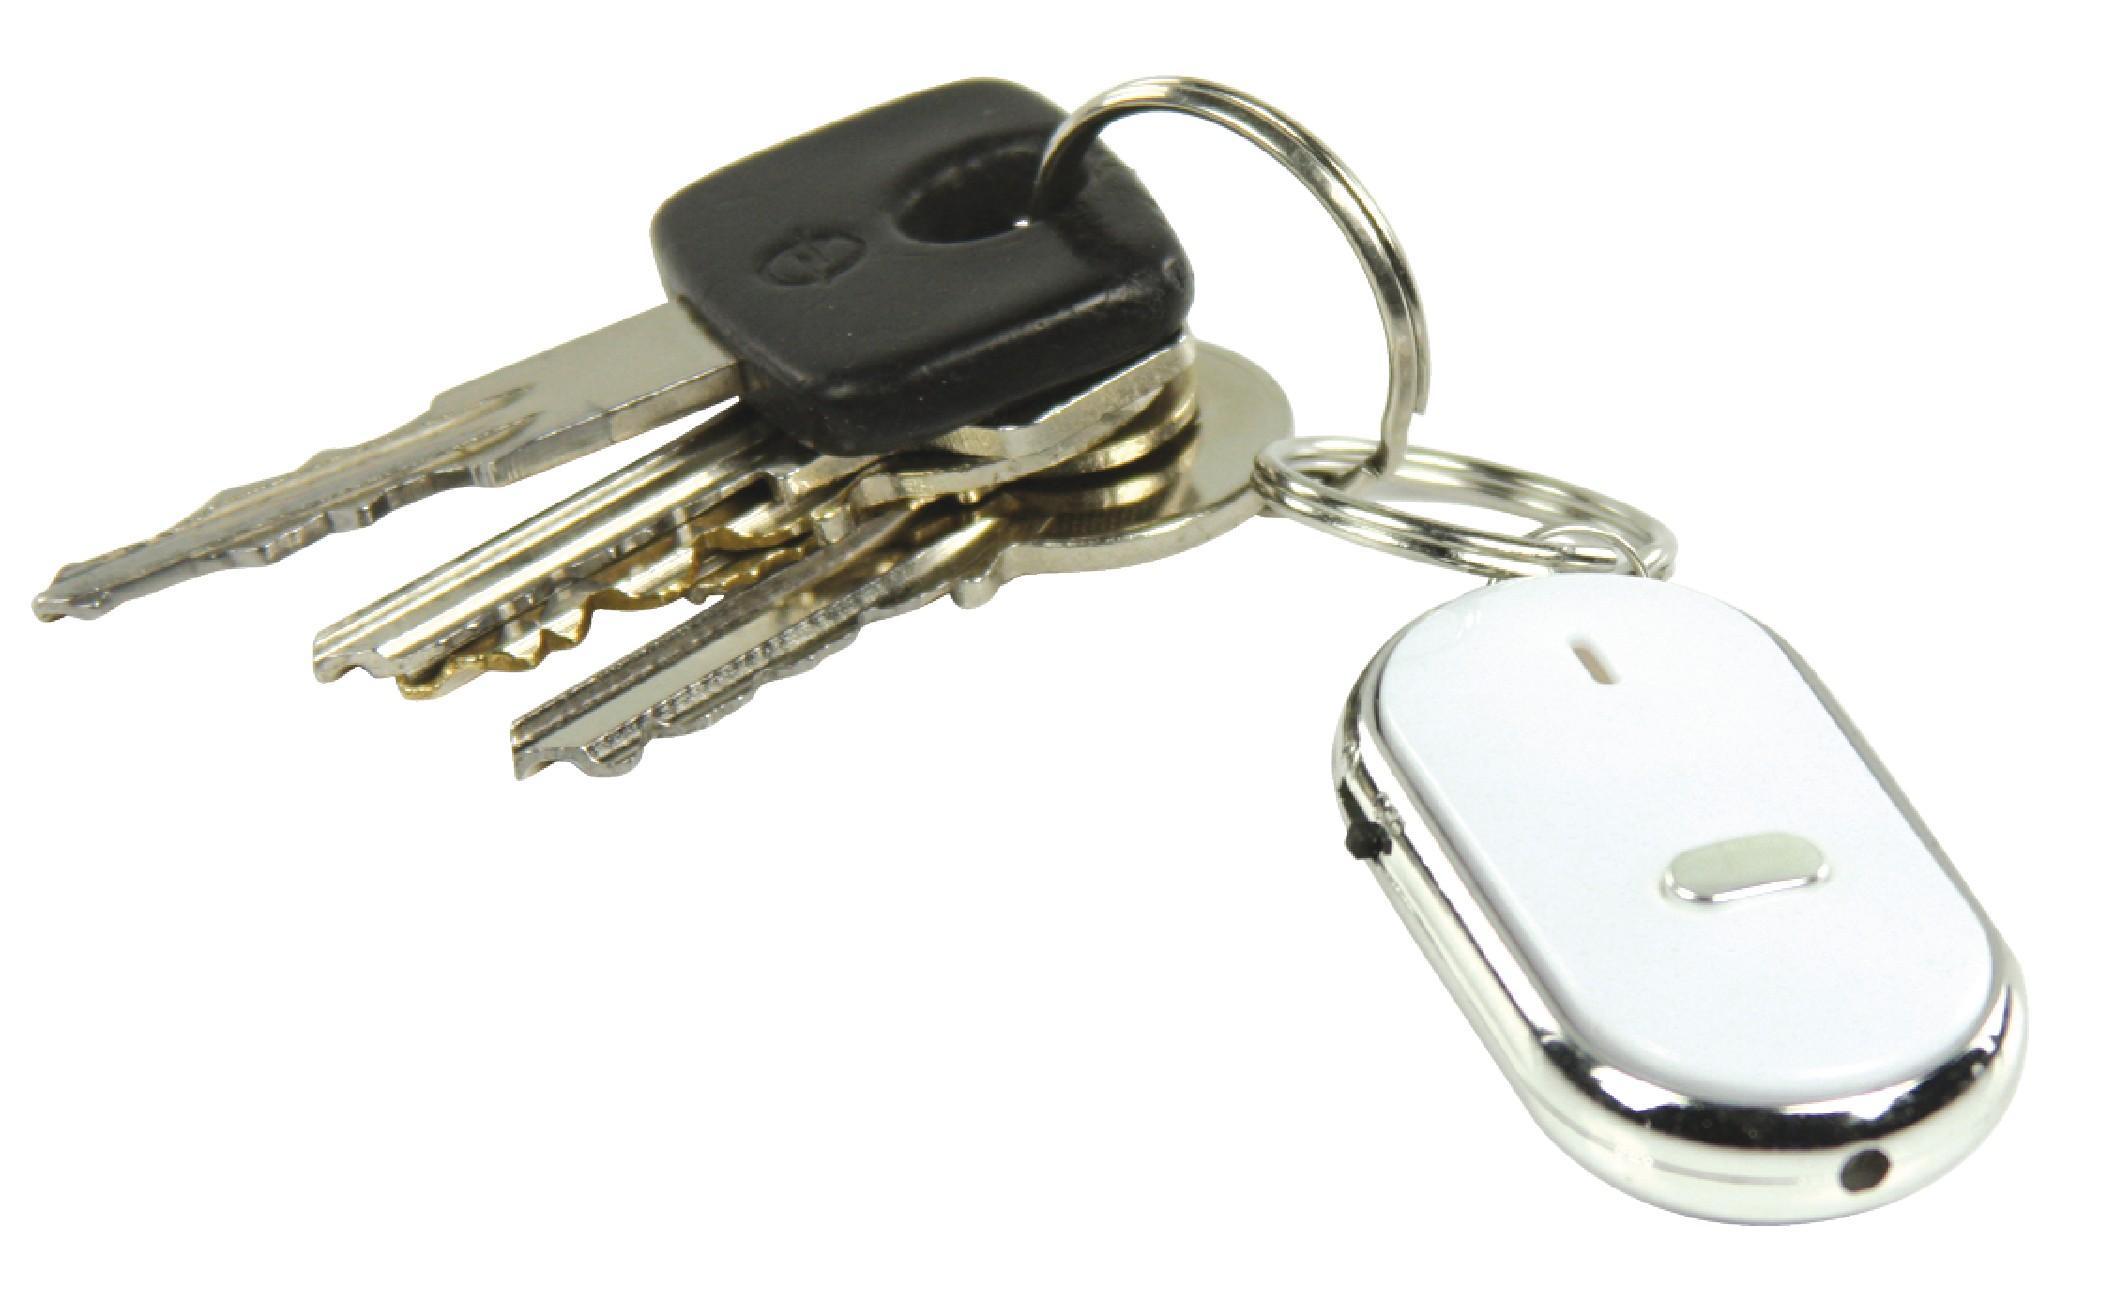 Thuis sleutelvinder - Keyfinder